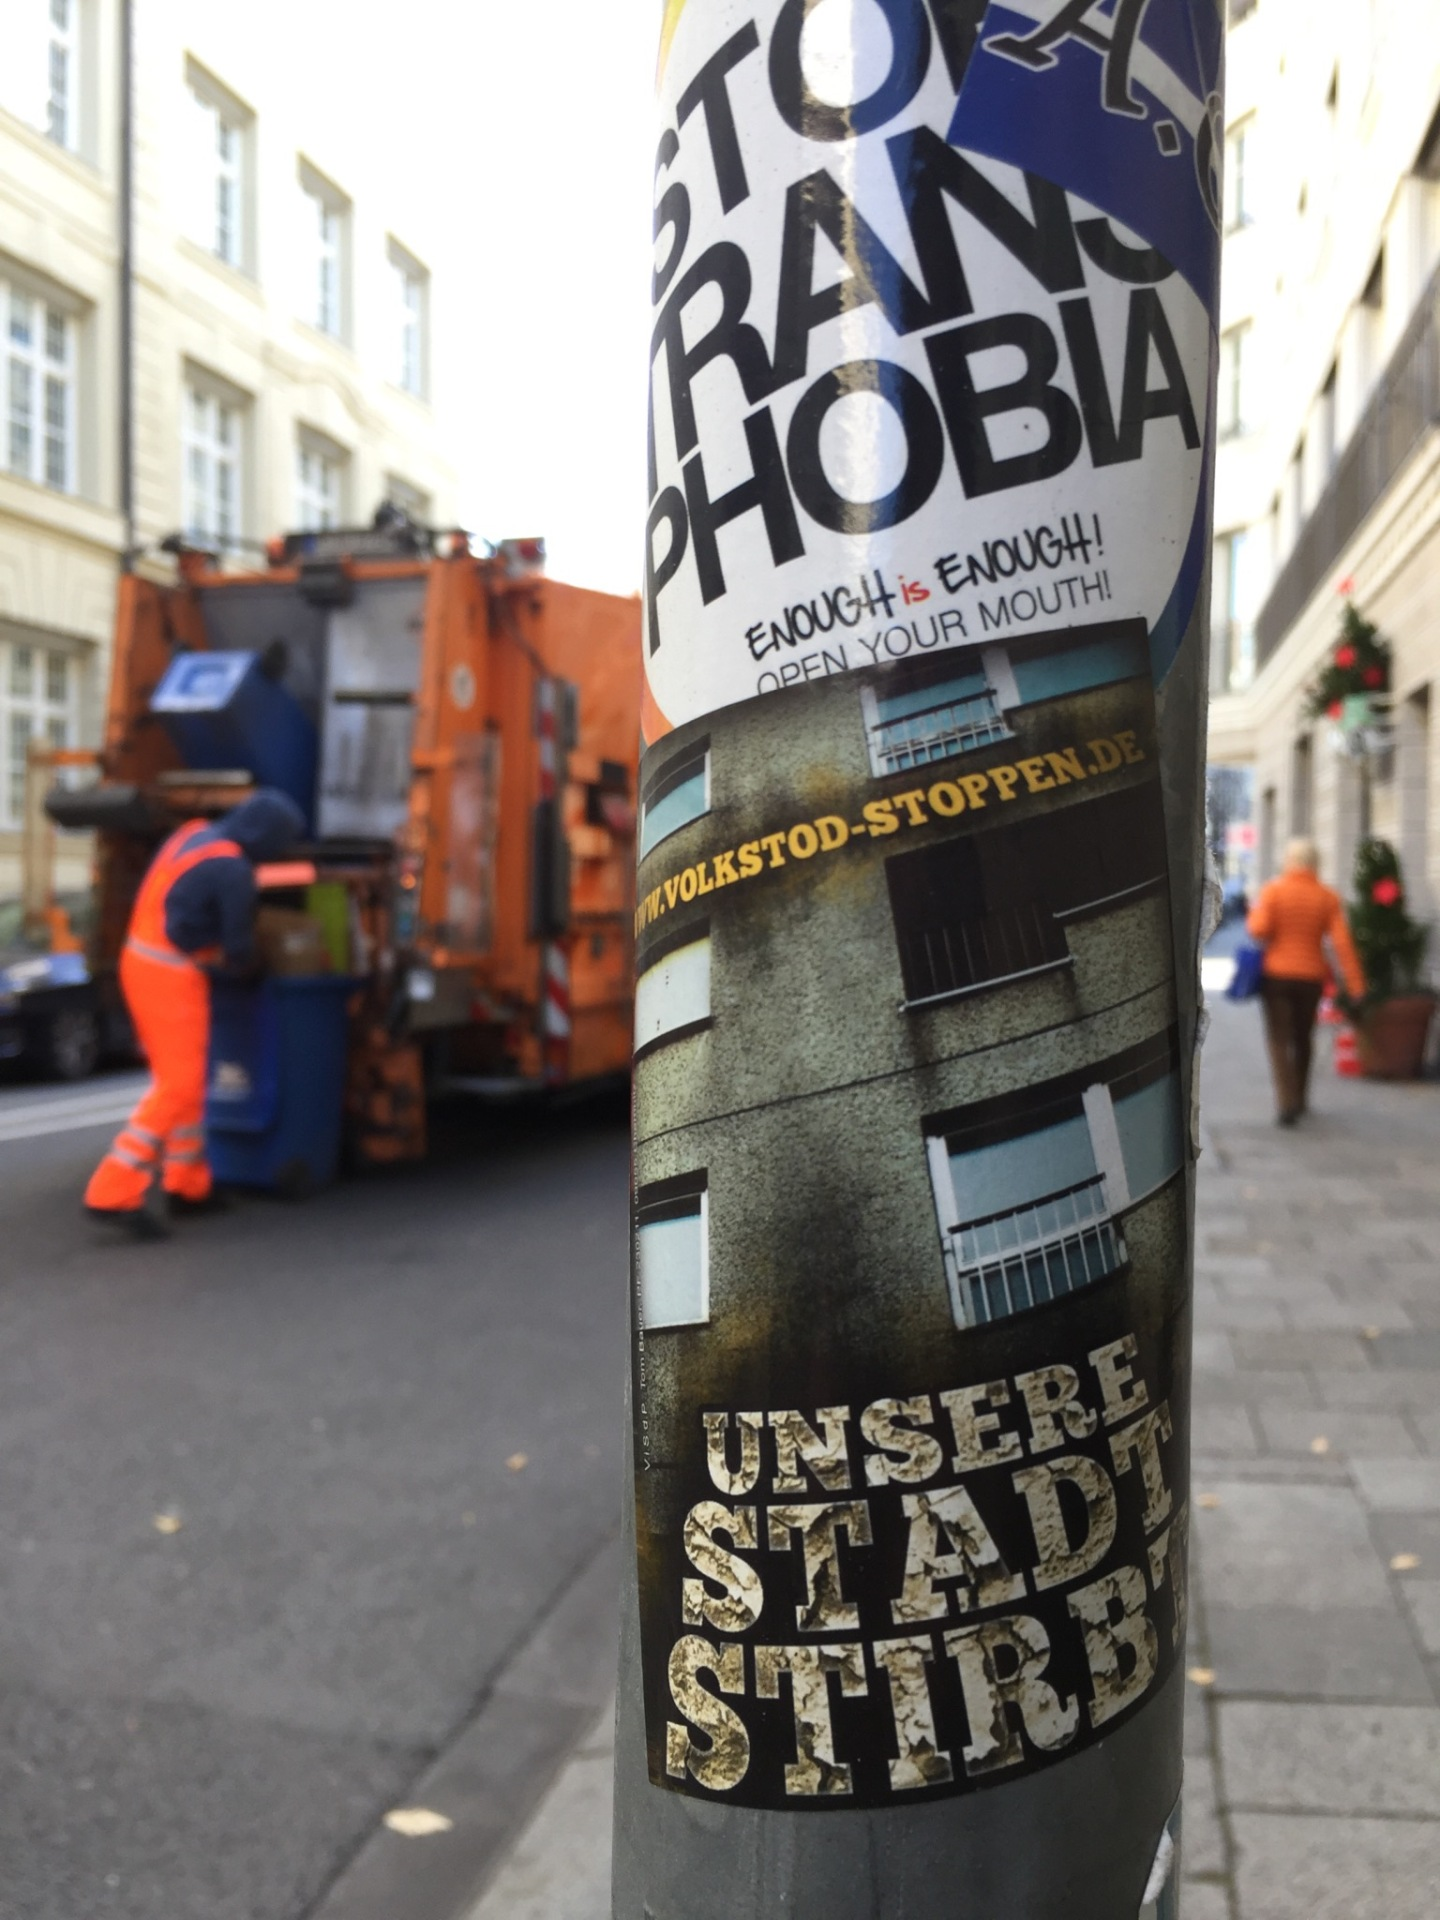 photo by Emmy Horstkamp trashmen on the streets of Munich